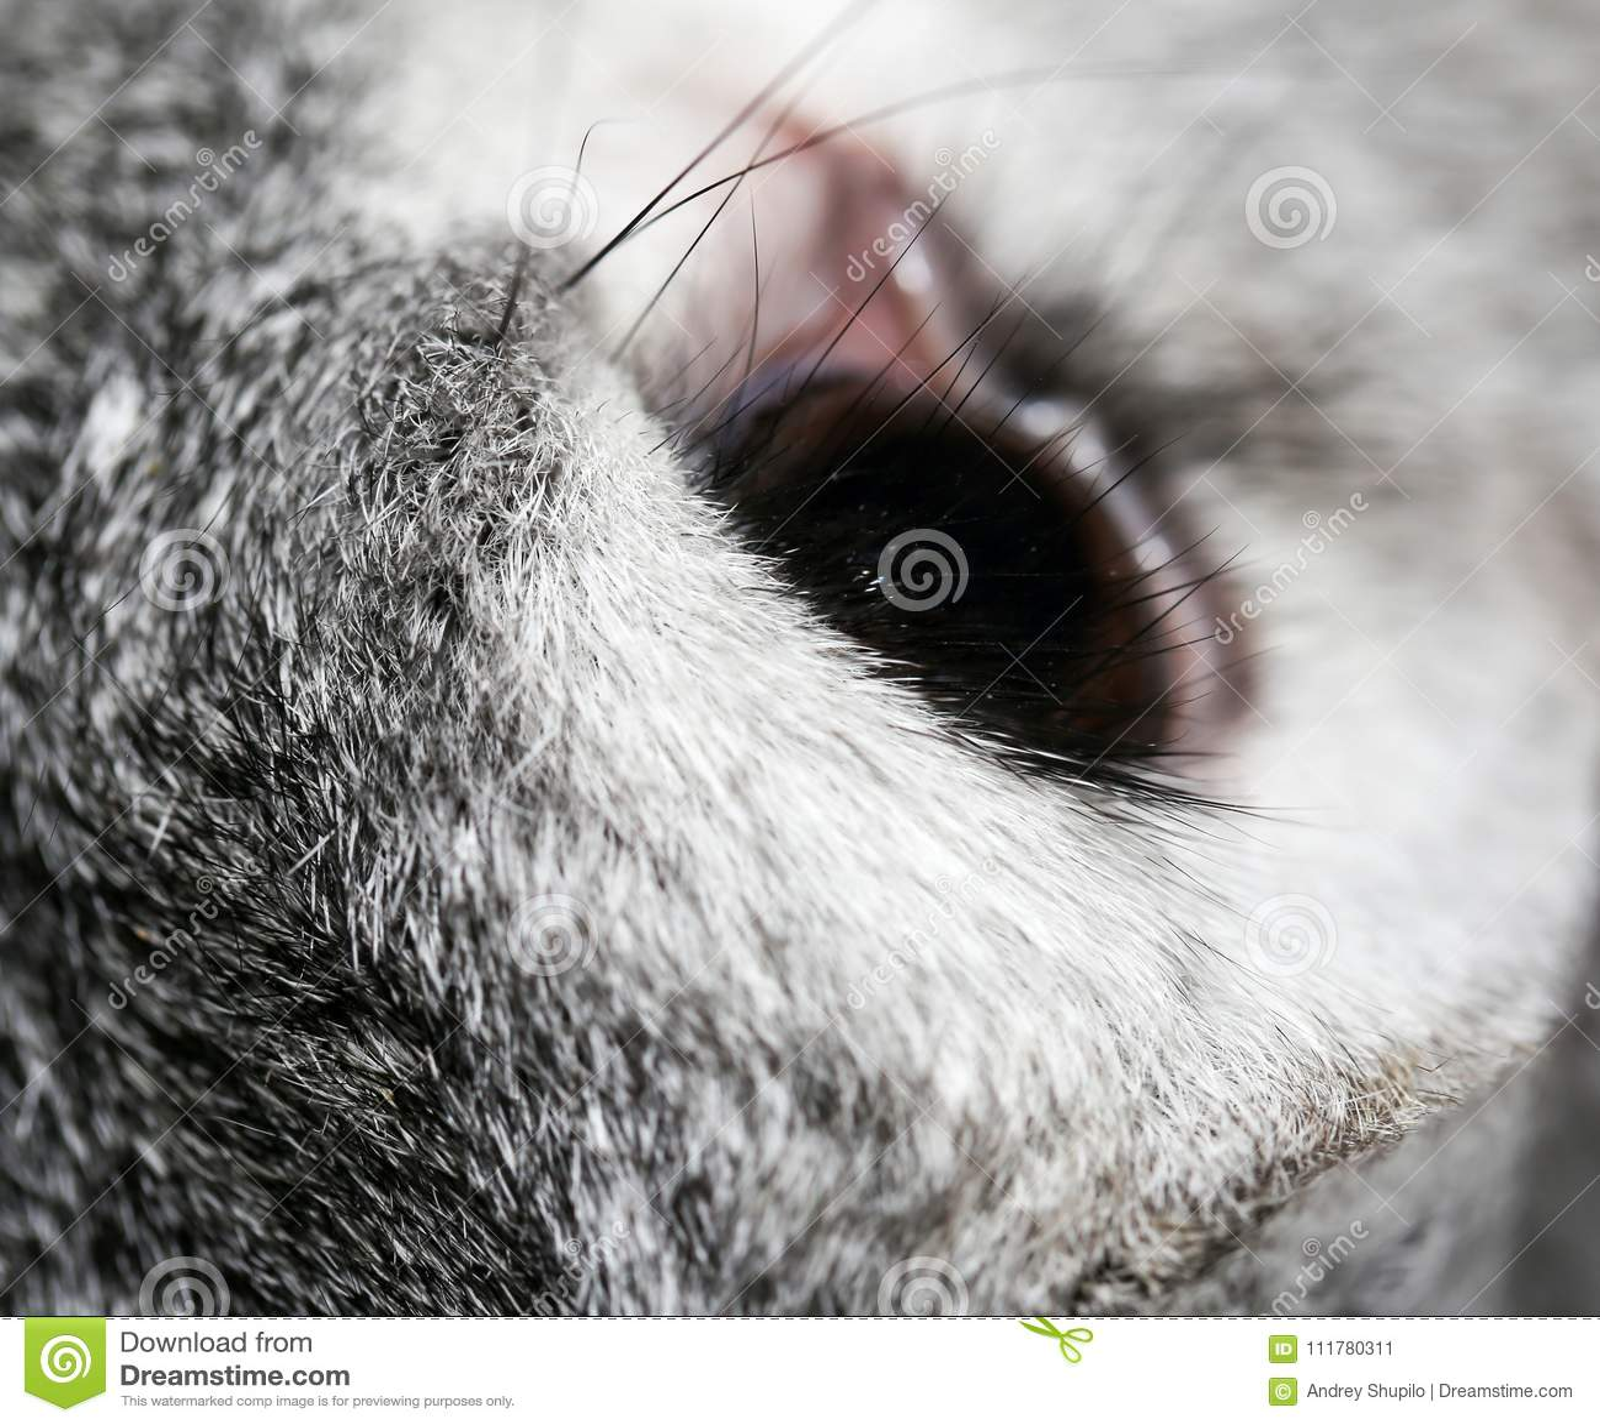 A rabbit`s eye on the farm. macro